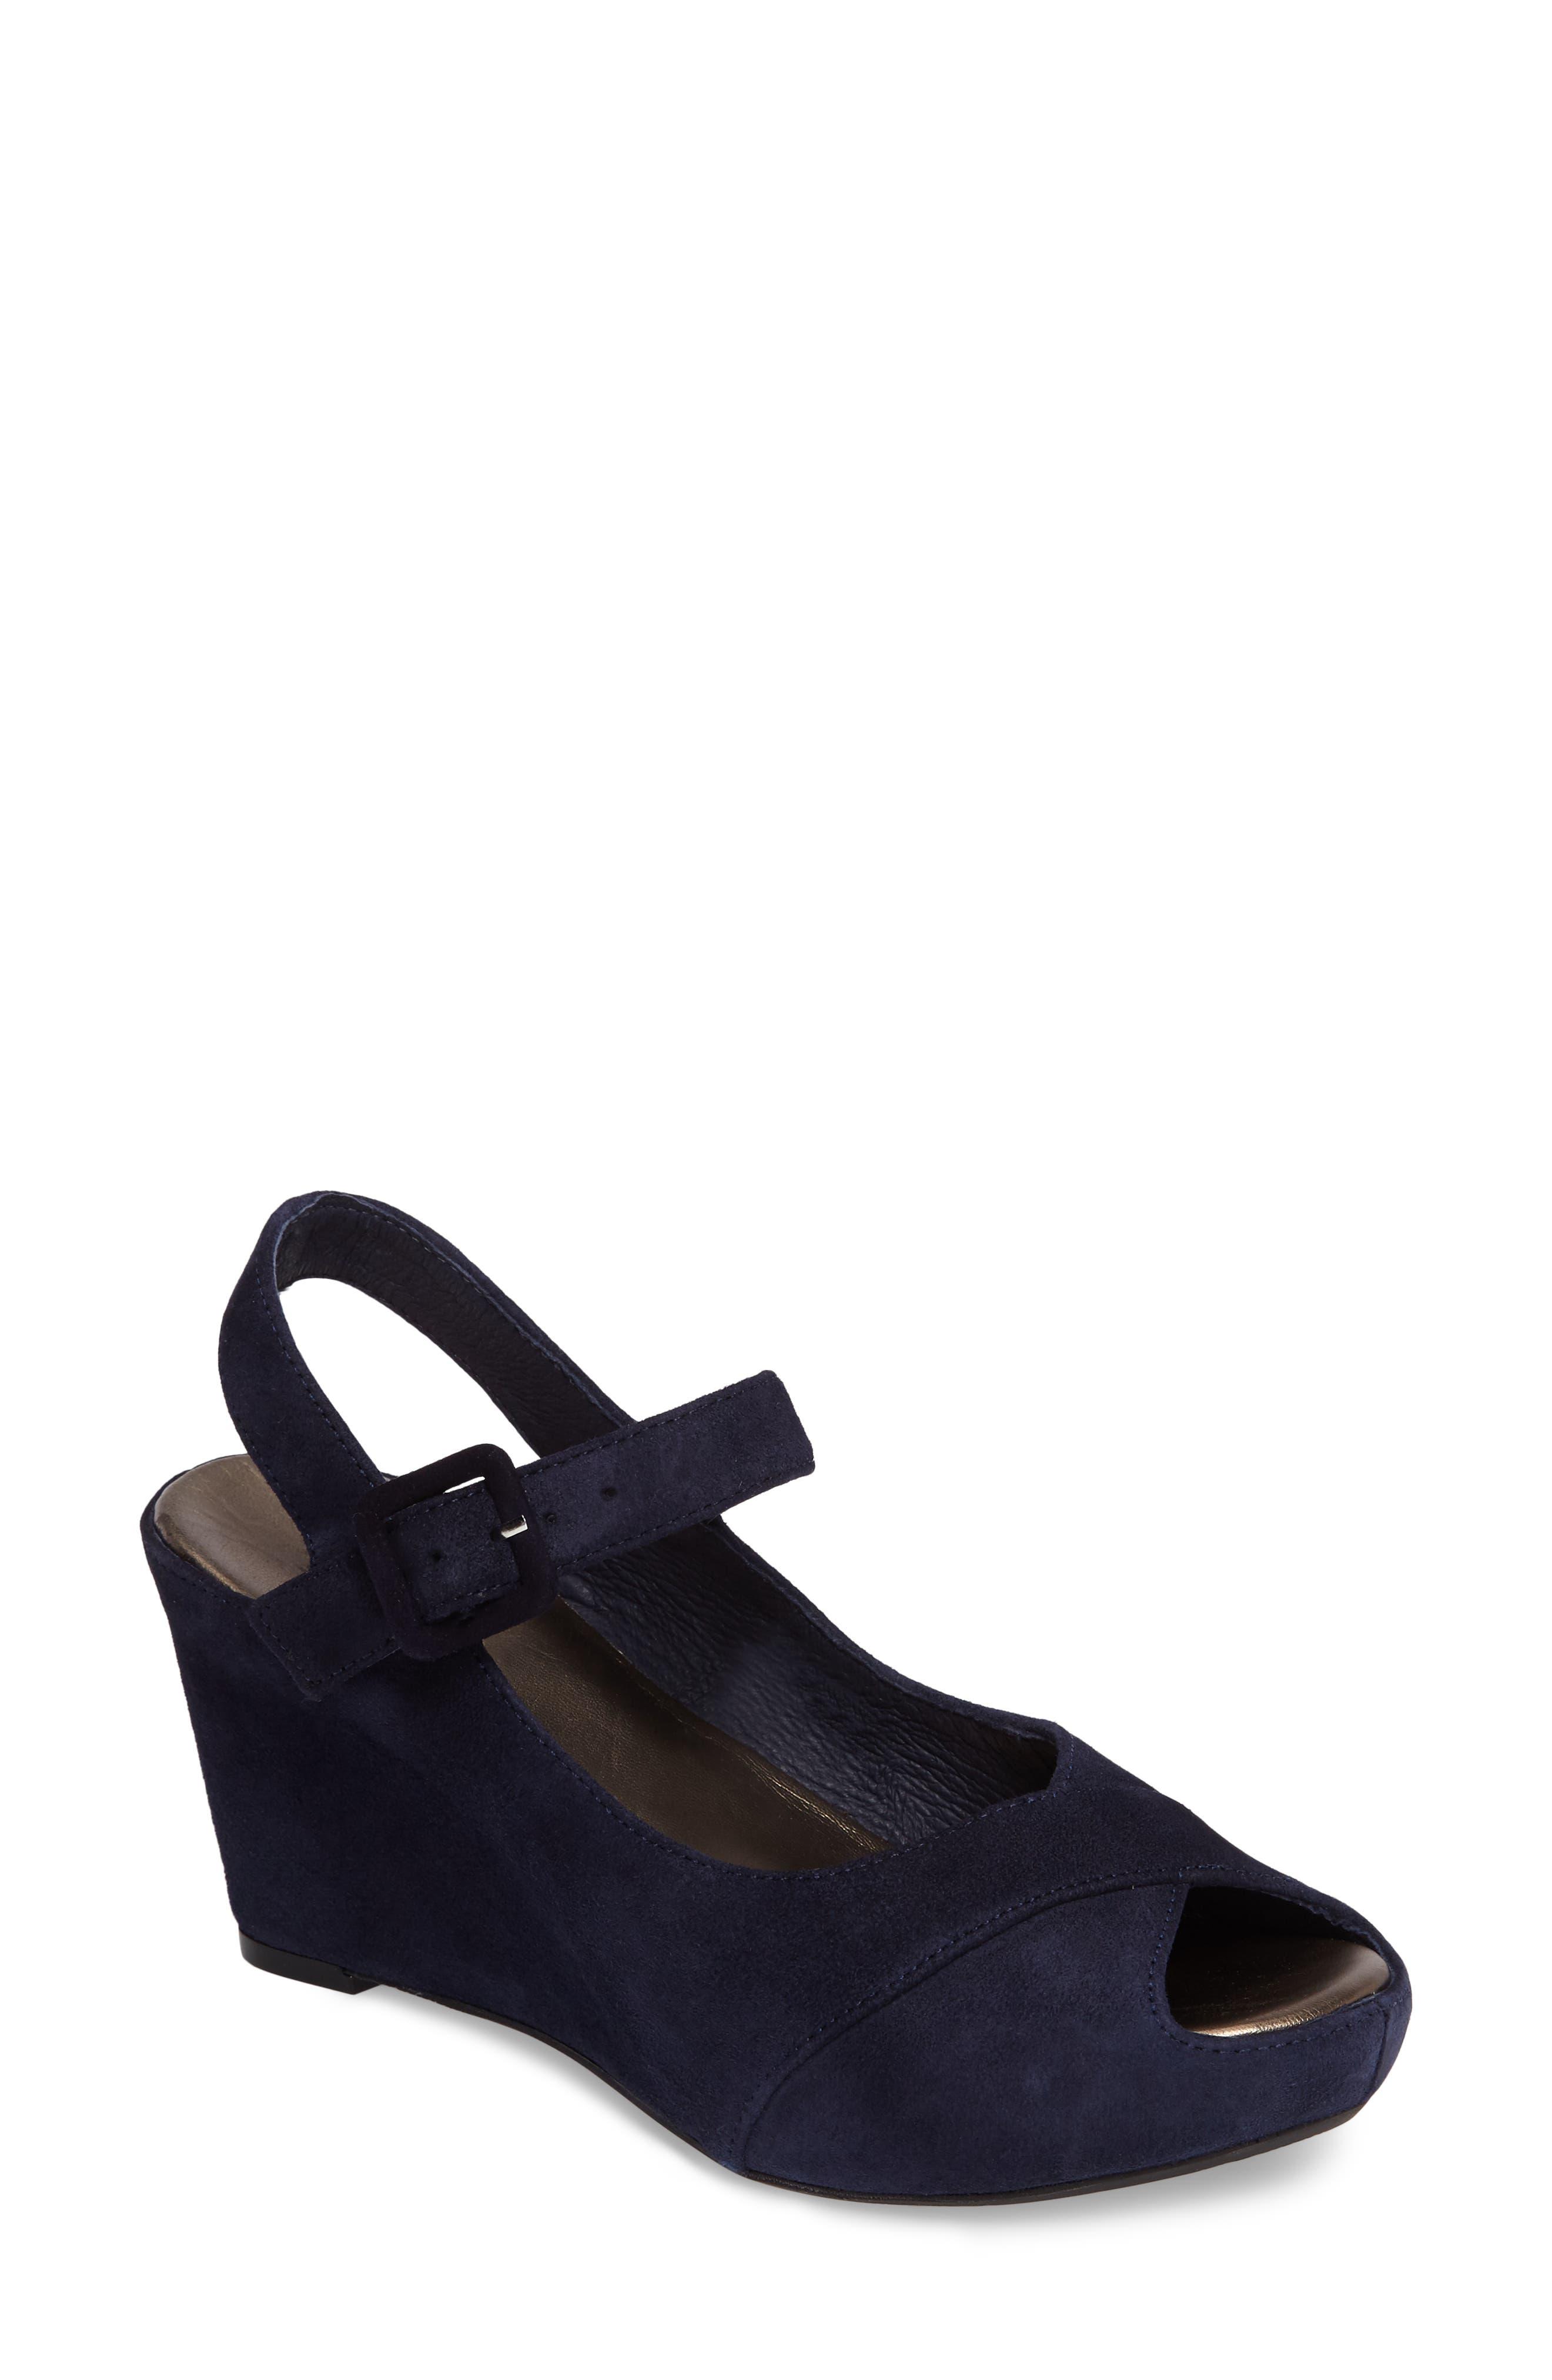 Tara Platform Wedge Sandal,                         Main,                         color, NAVY SUEDE